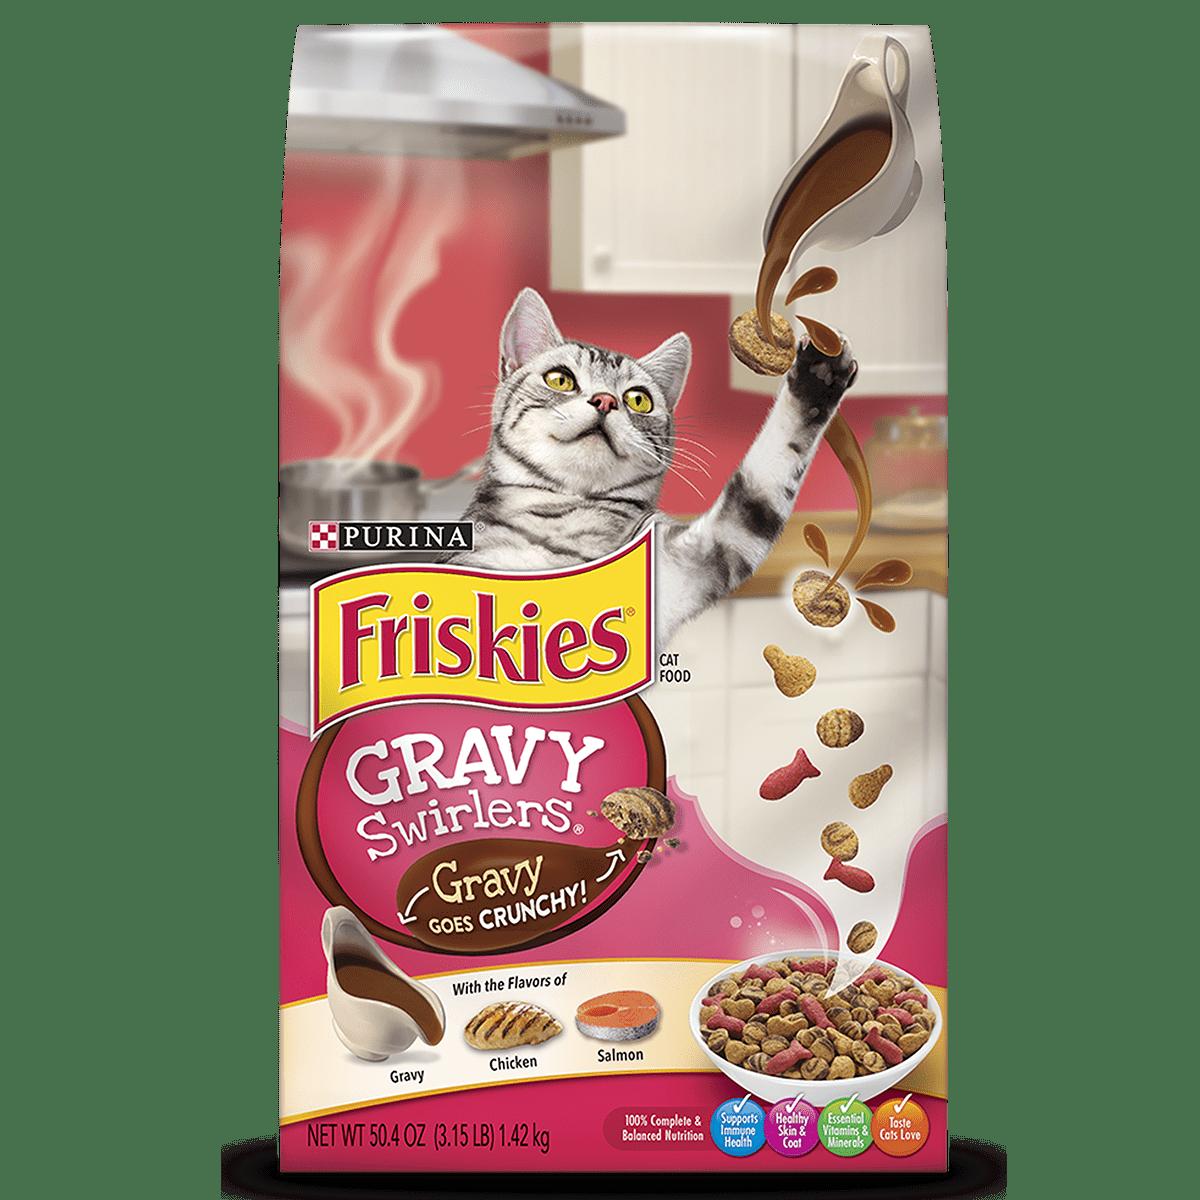 Friskies Dry Cat Food; Gravy Swirlers - 3.15 lb. Bag